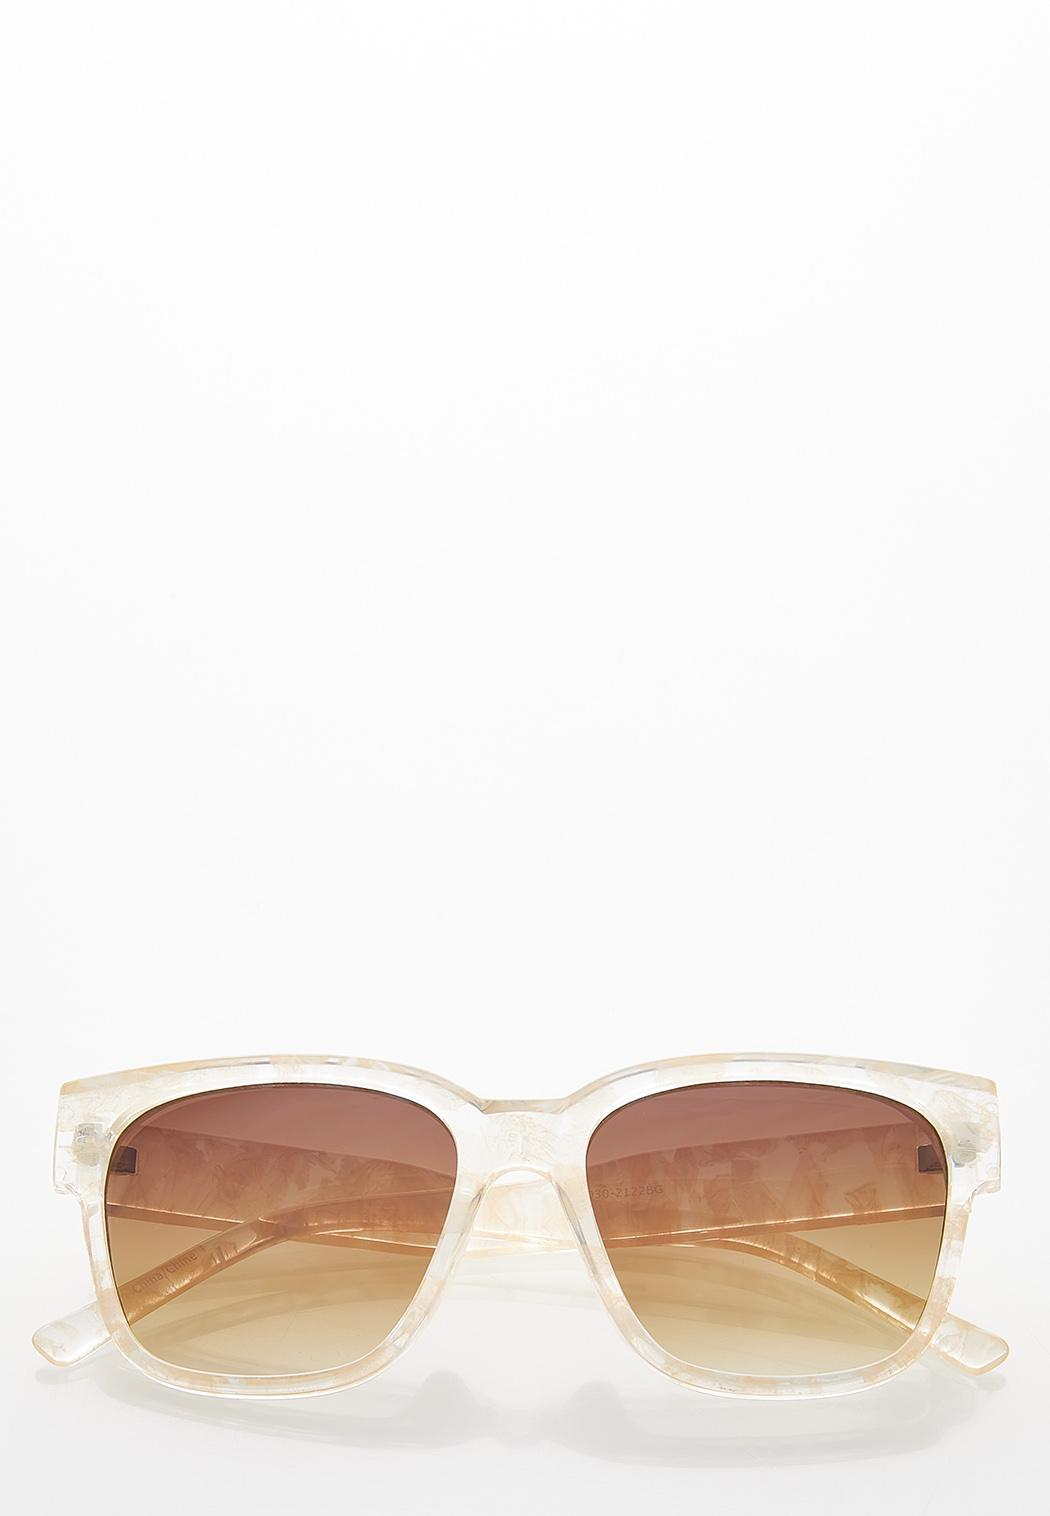 Clear Tortoise Sunglasses